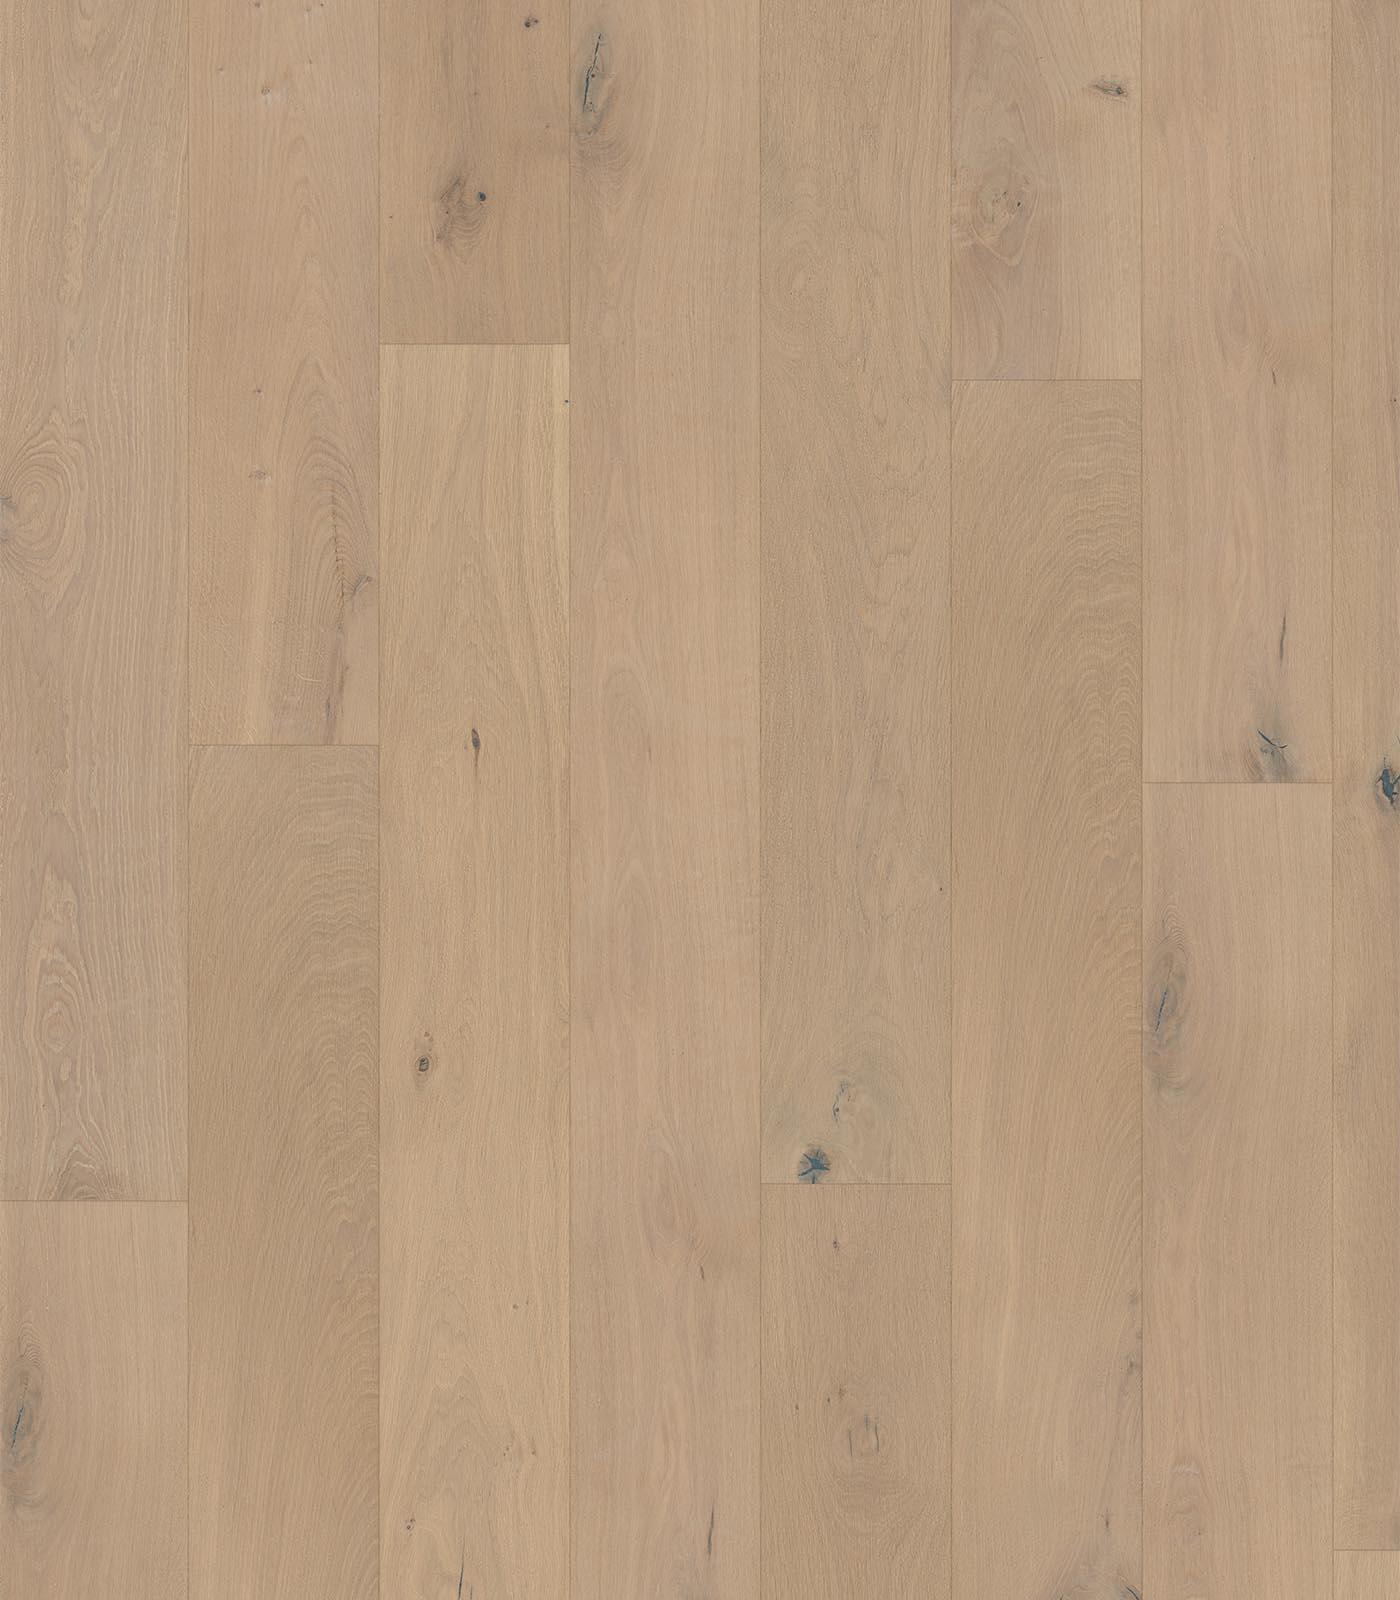 Cayman-Island Collection-European Oak floors-flat